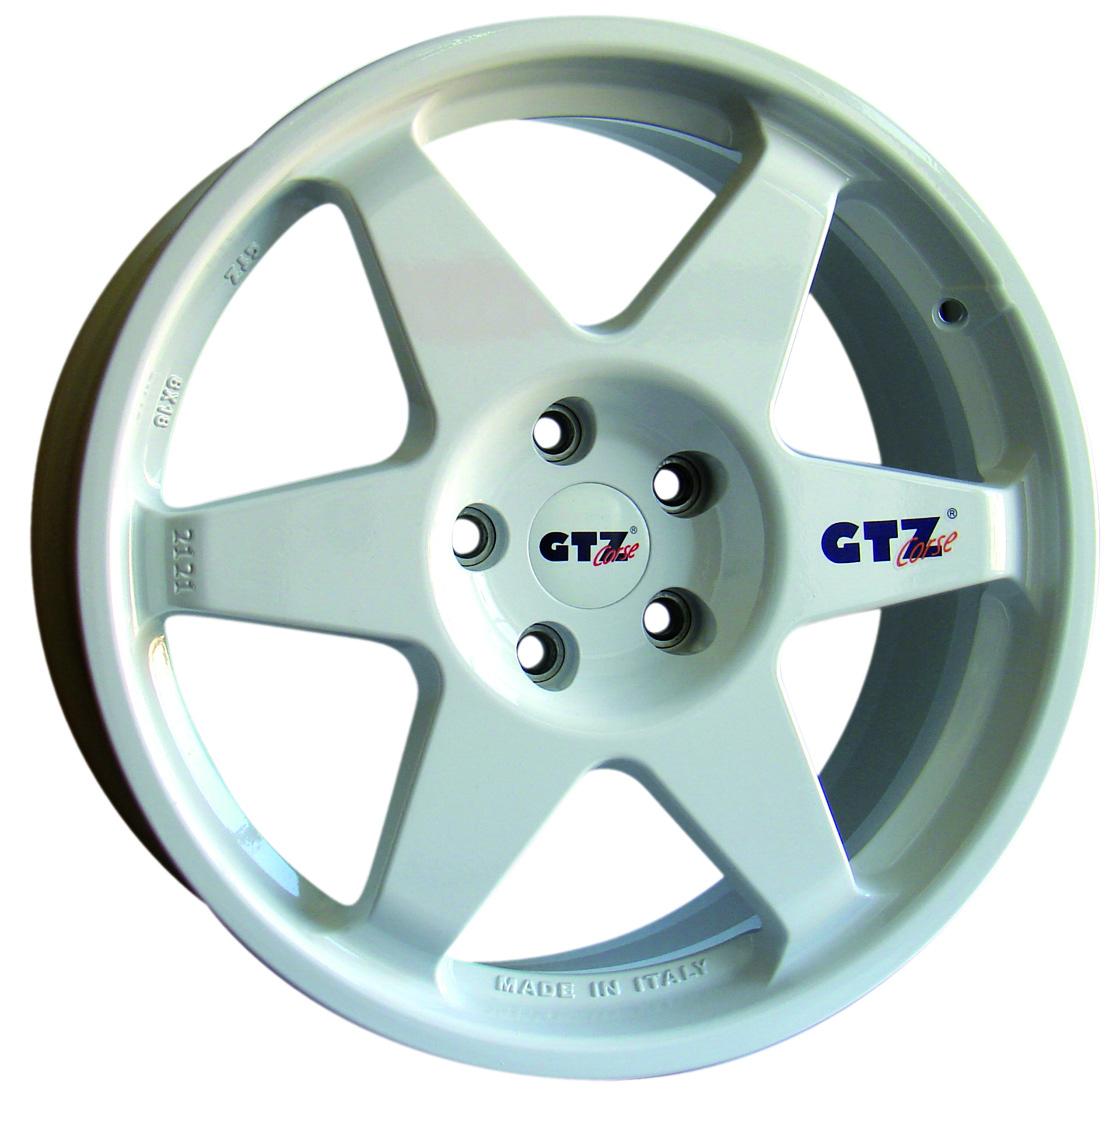 SPEEDLINE CORSE GTZ type 2121 8x18 5x100 ET38 WHITE